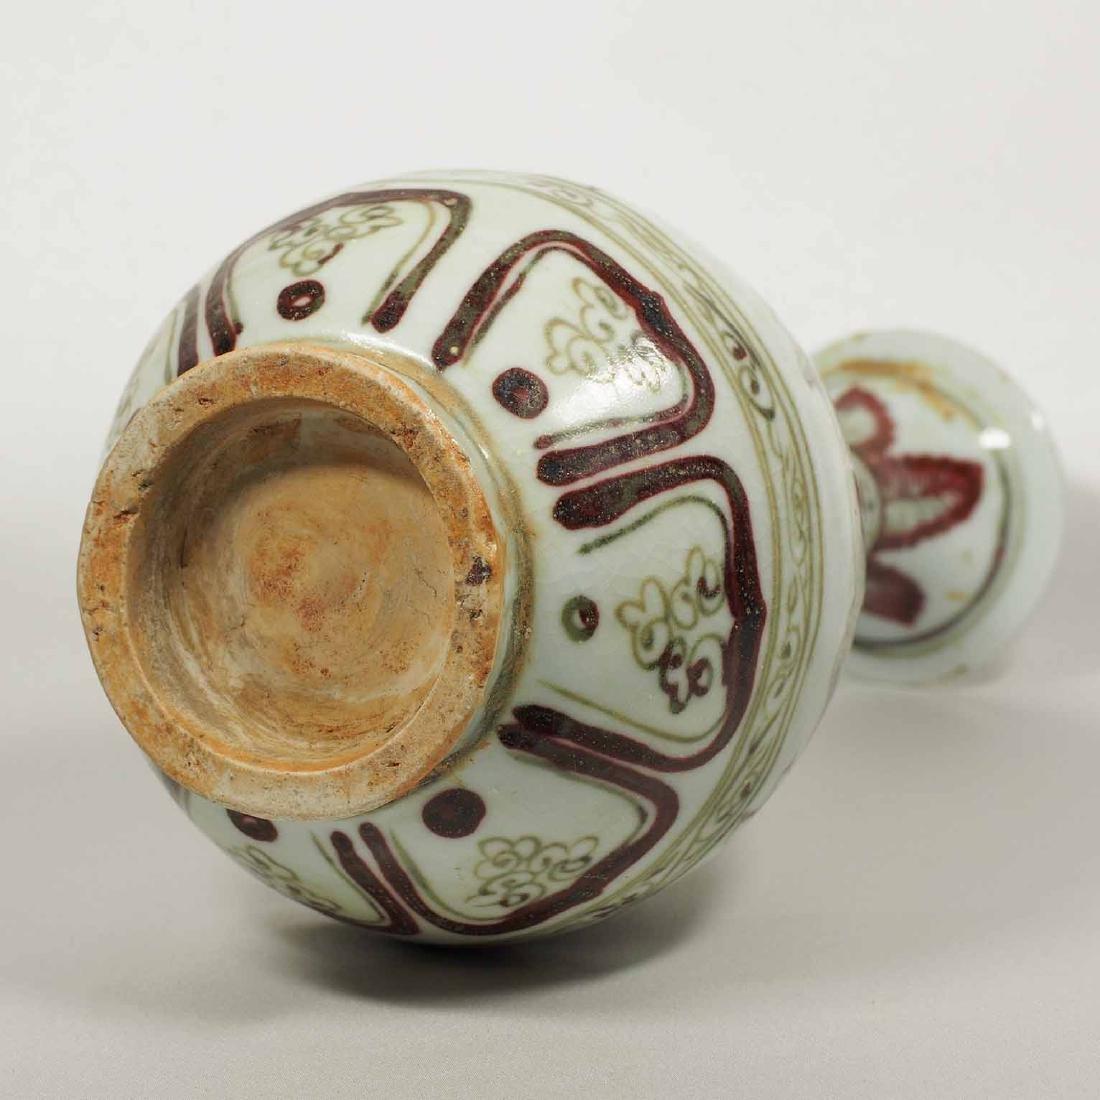 Yuhuchun Vase with Dragon Design, Yuan Dynasty - 8